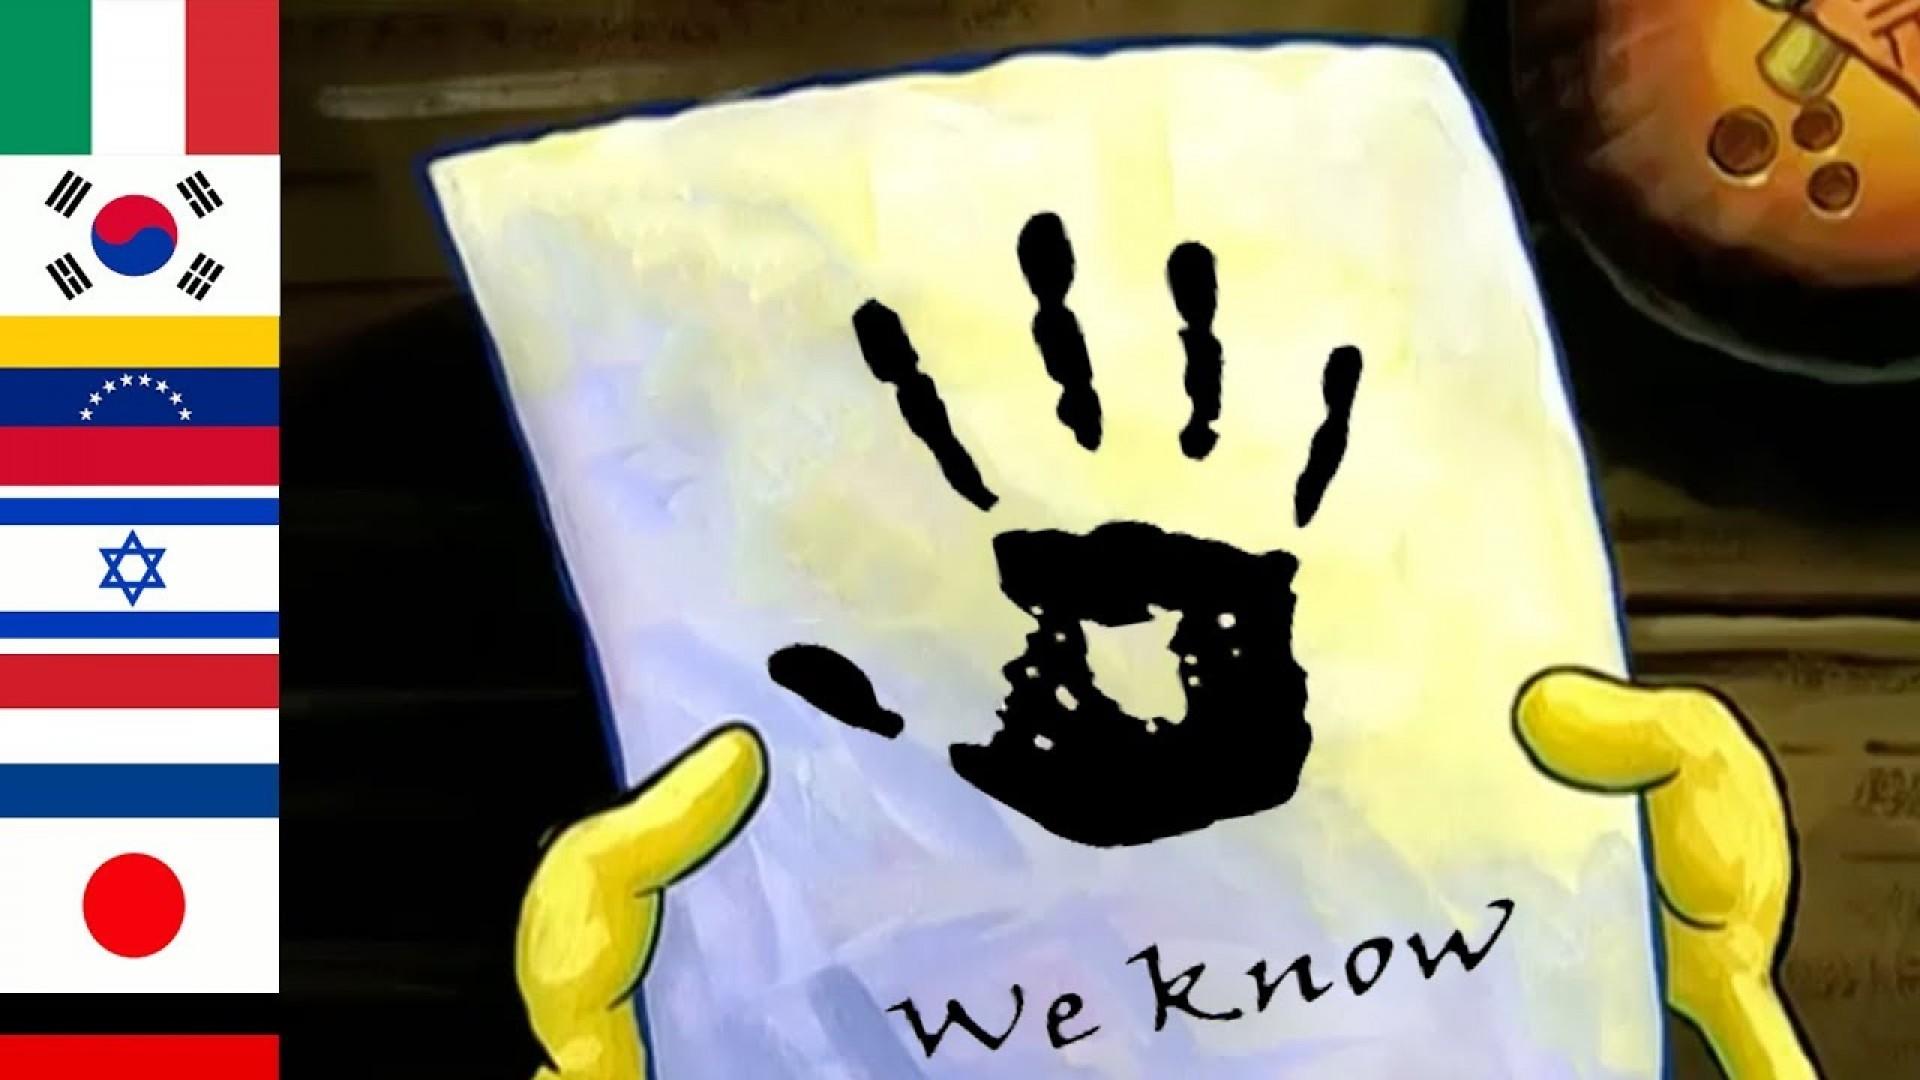 002 Essay Example Spongebob The Unforgettable Font Copy And Paste Gif Meme 1920